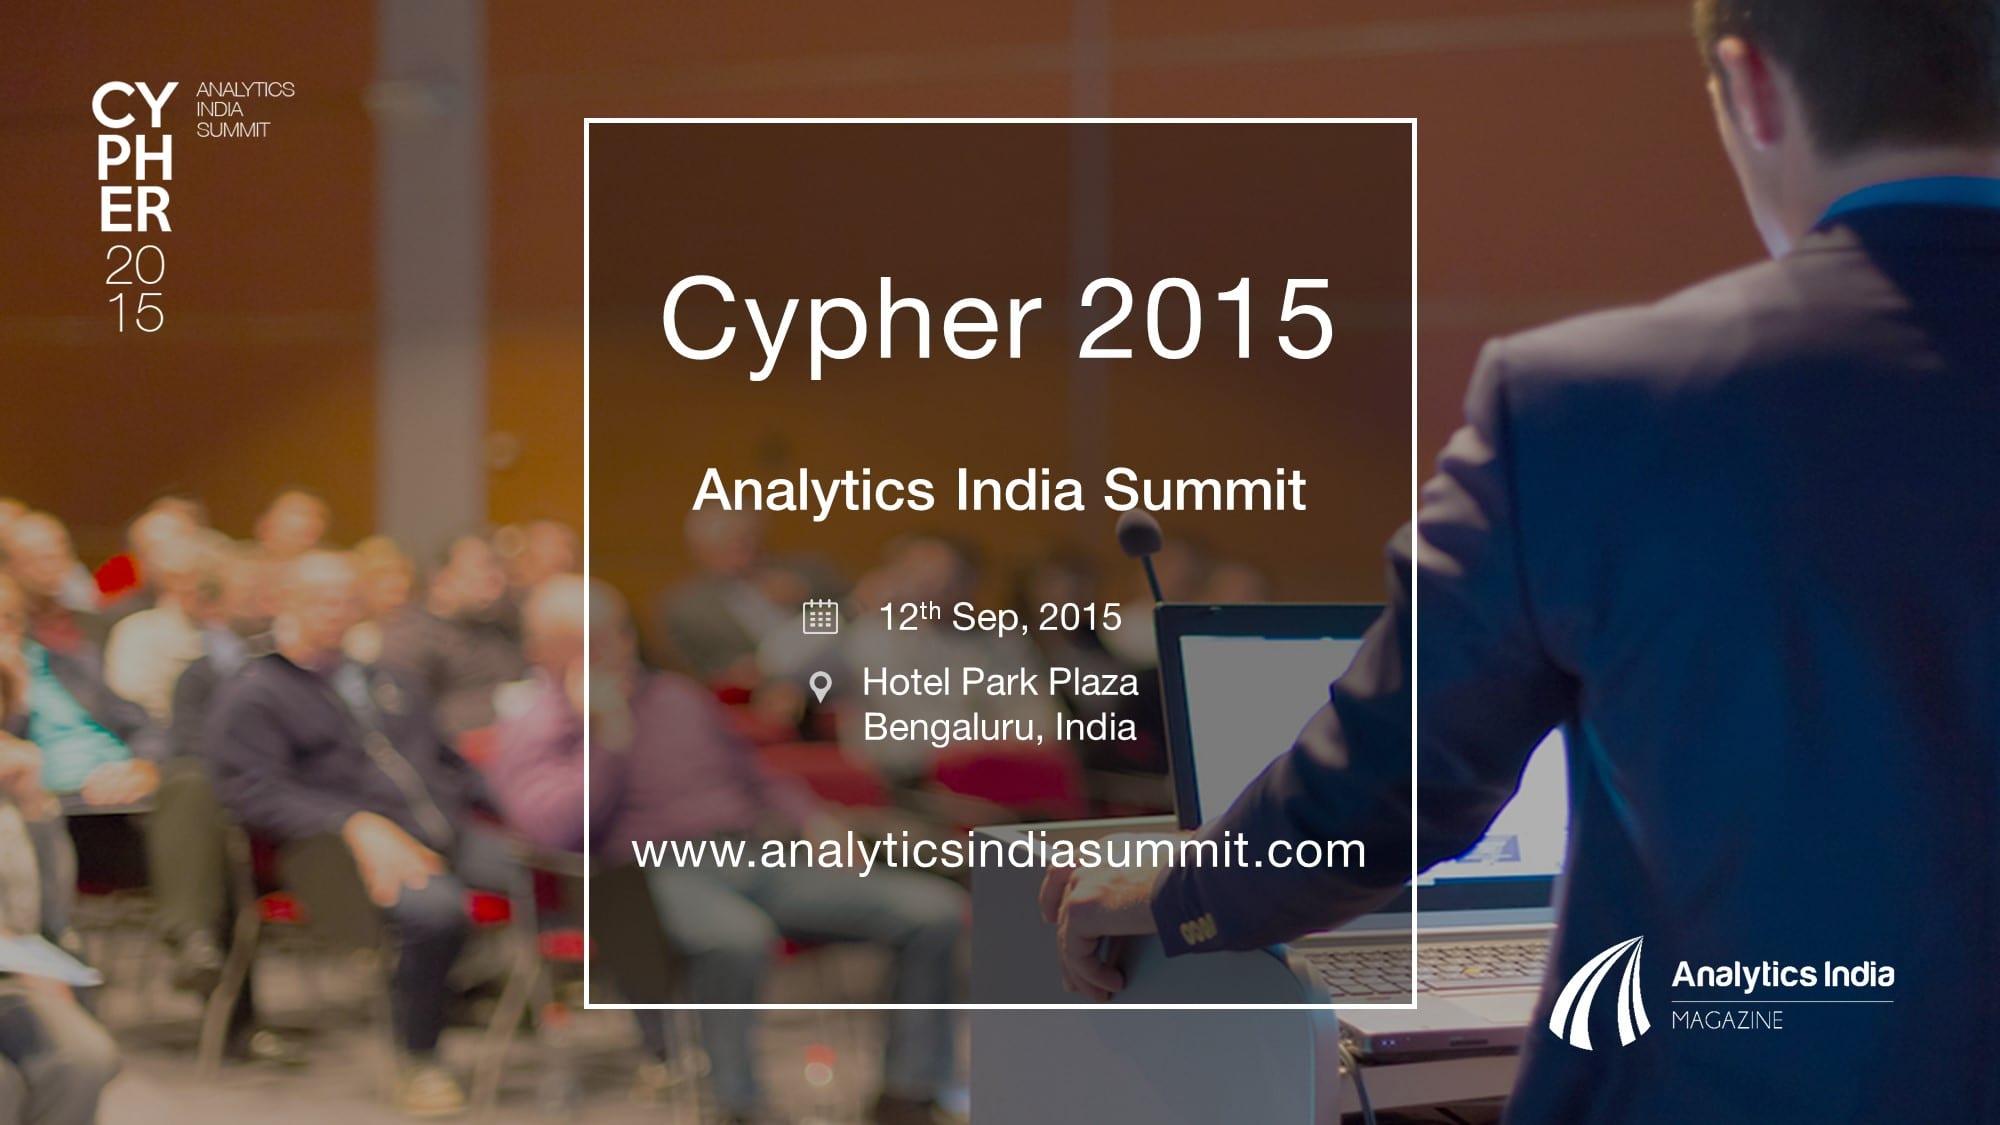 Cypher 2015